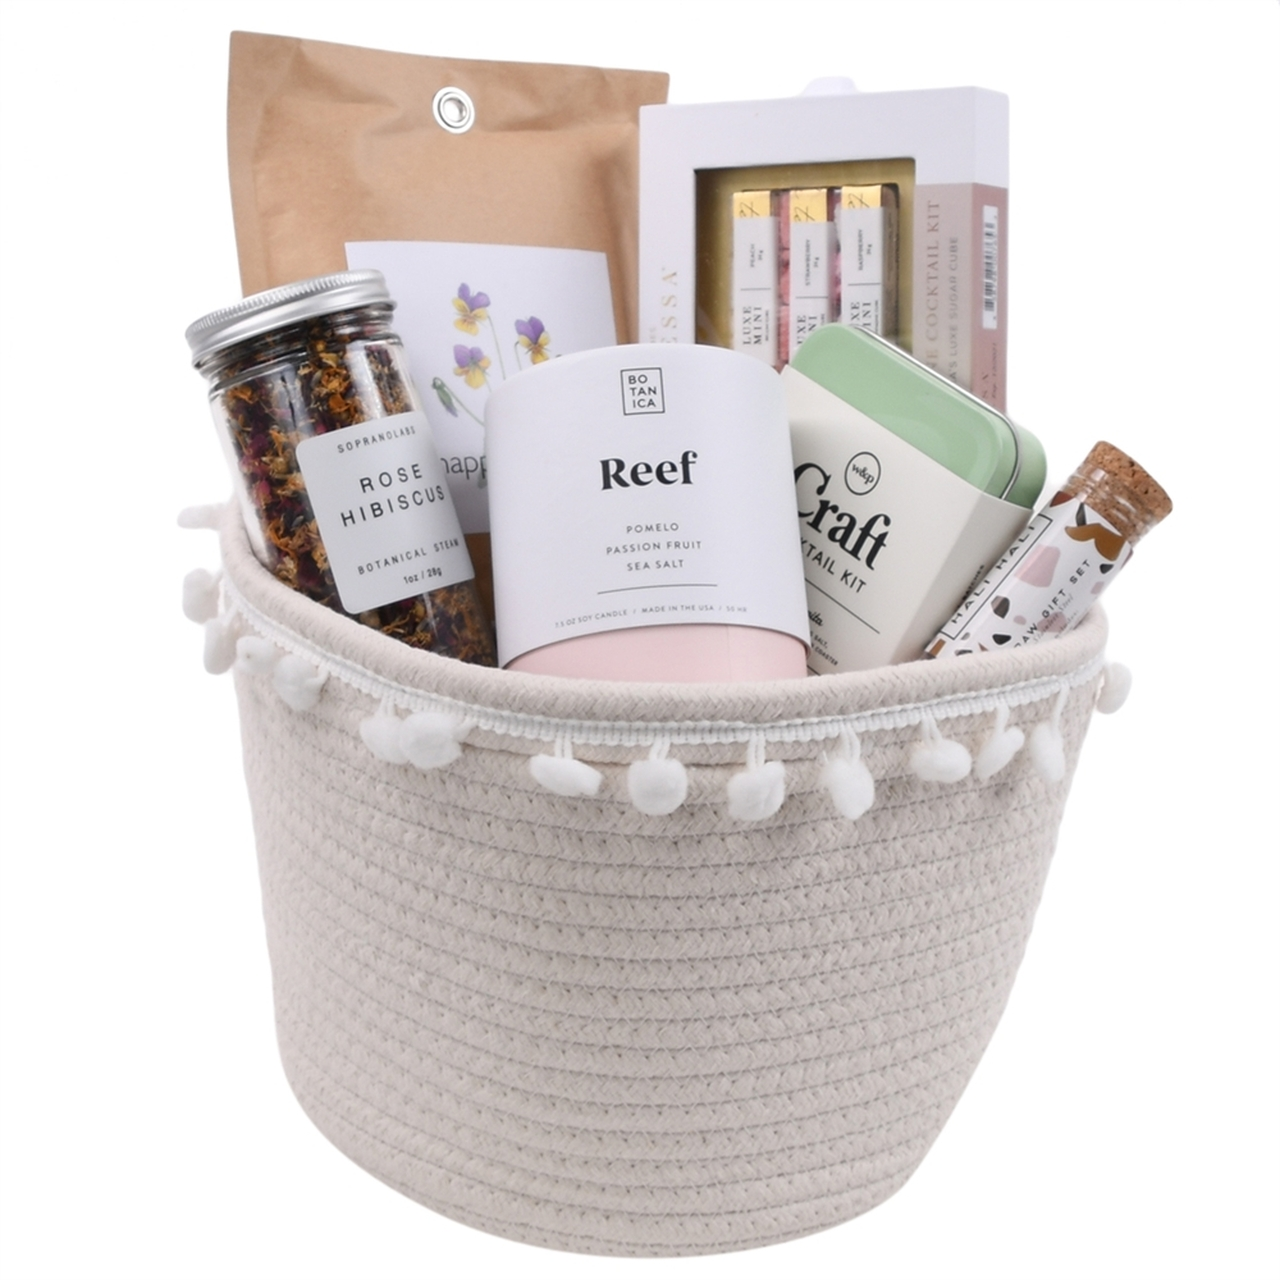 Birthday Gift Basket - Your Day